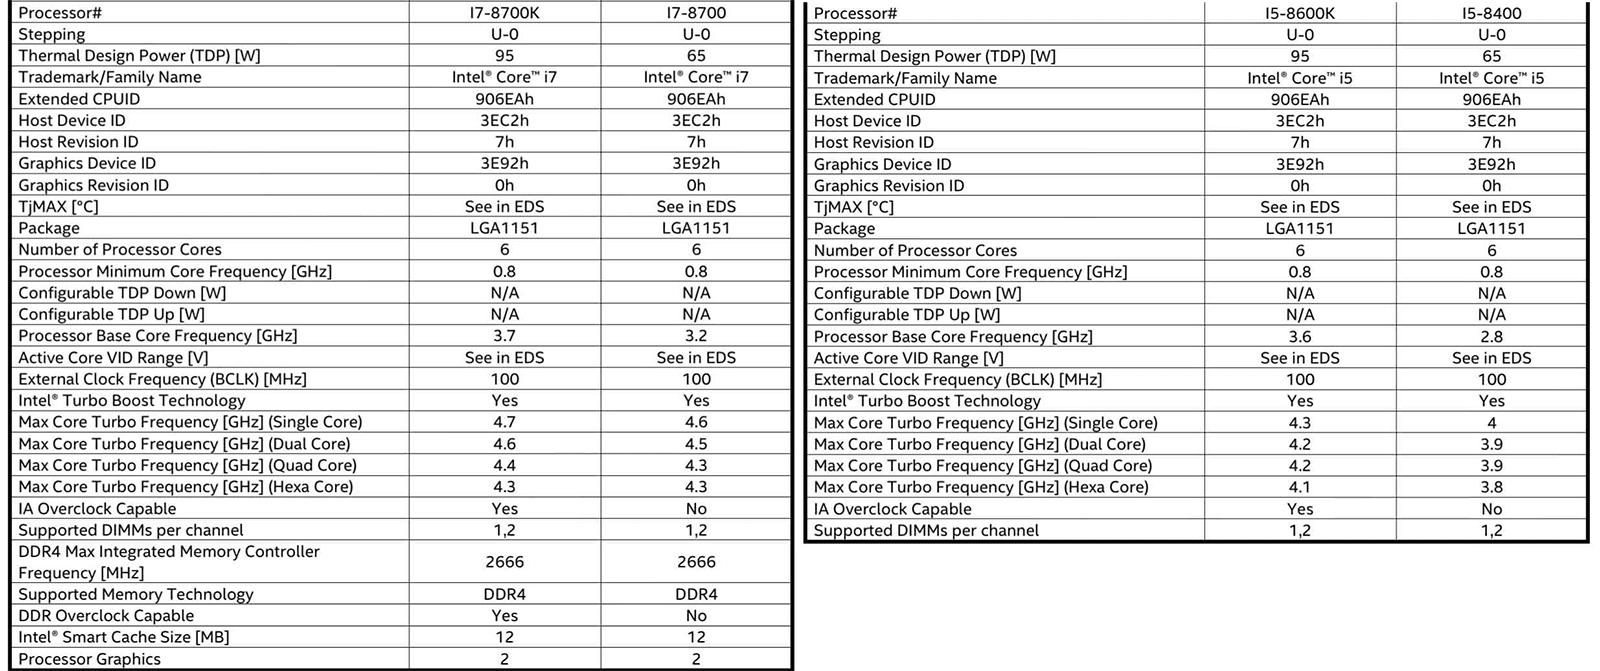 coffee - Шестиядерные процессоры Intel Coffee Lake - 14 нм и супер Turbo Boost